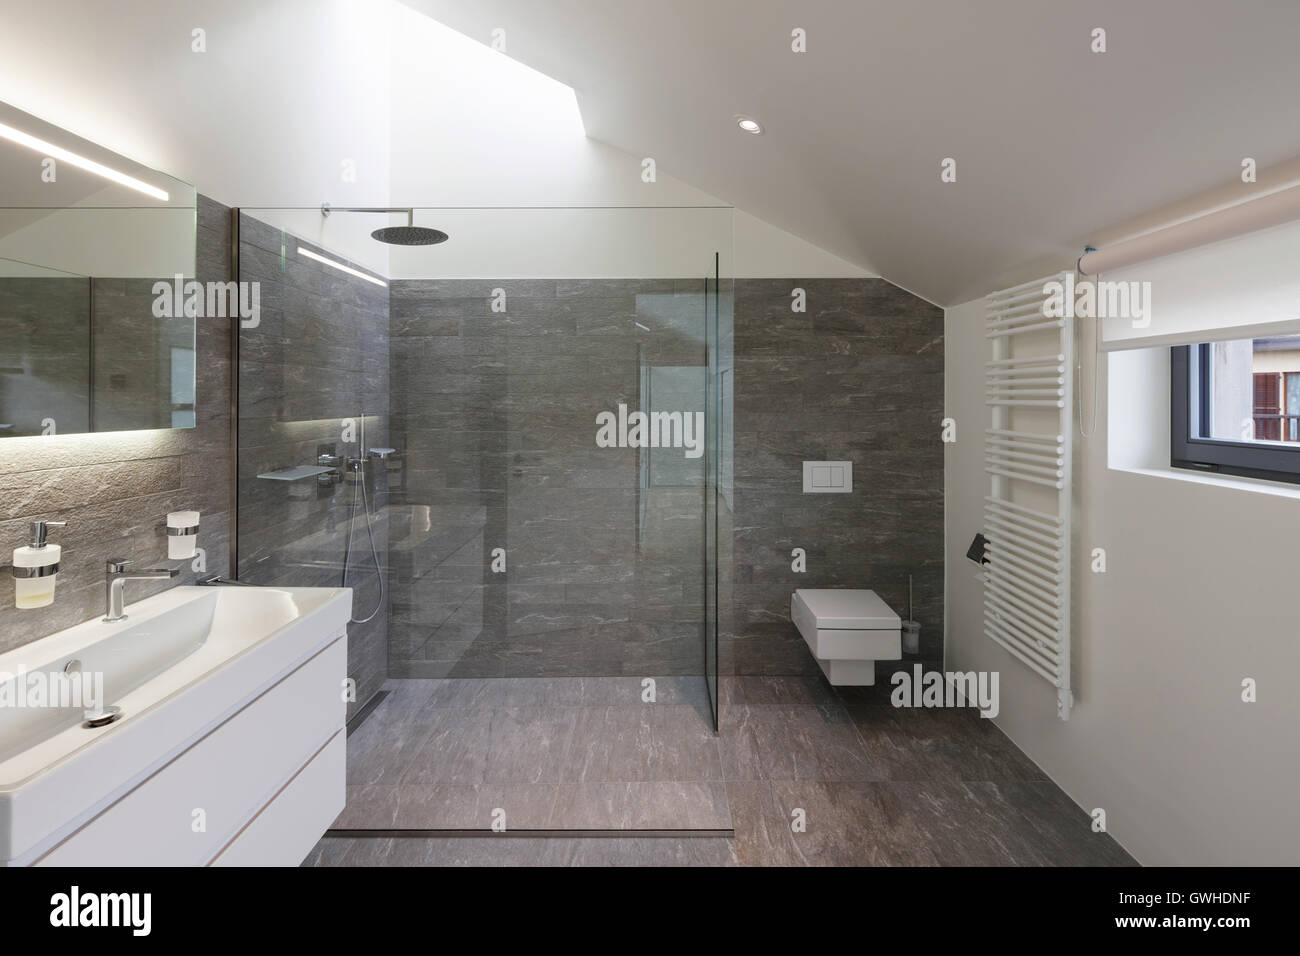 Inneren Des Hauses Um Moderne Badgestaltung Stockfoto Bild